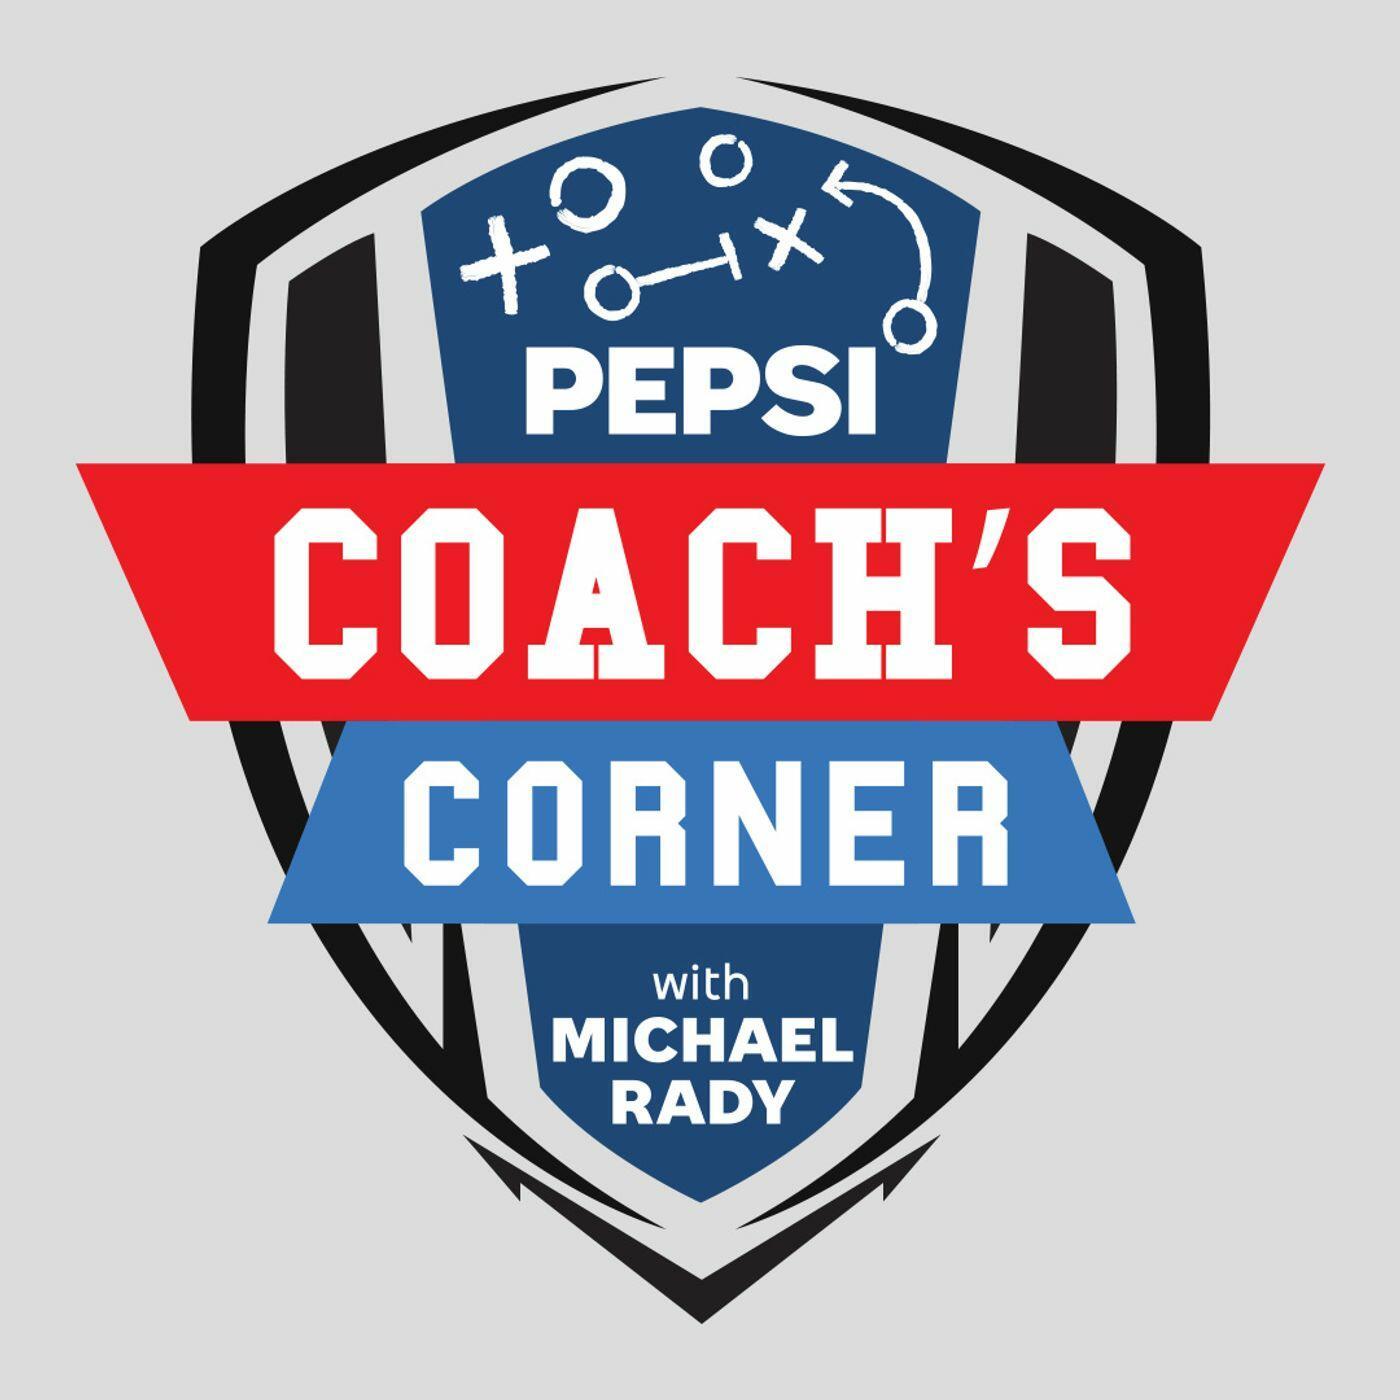 Pepsi Coach's Corner with Michael Rady